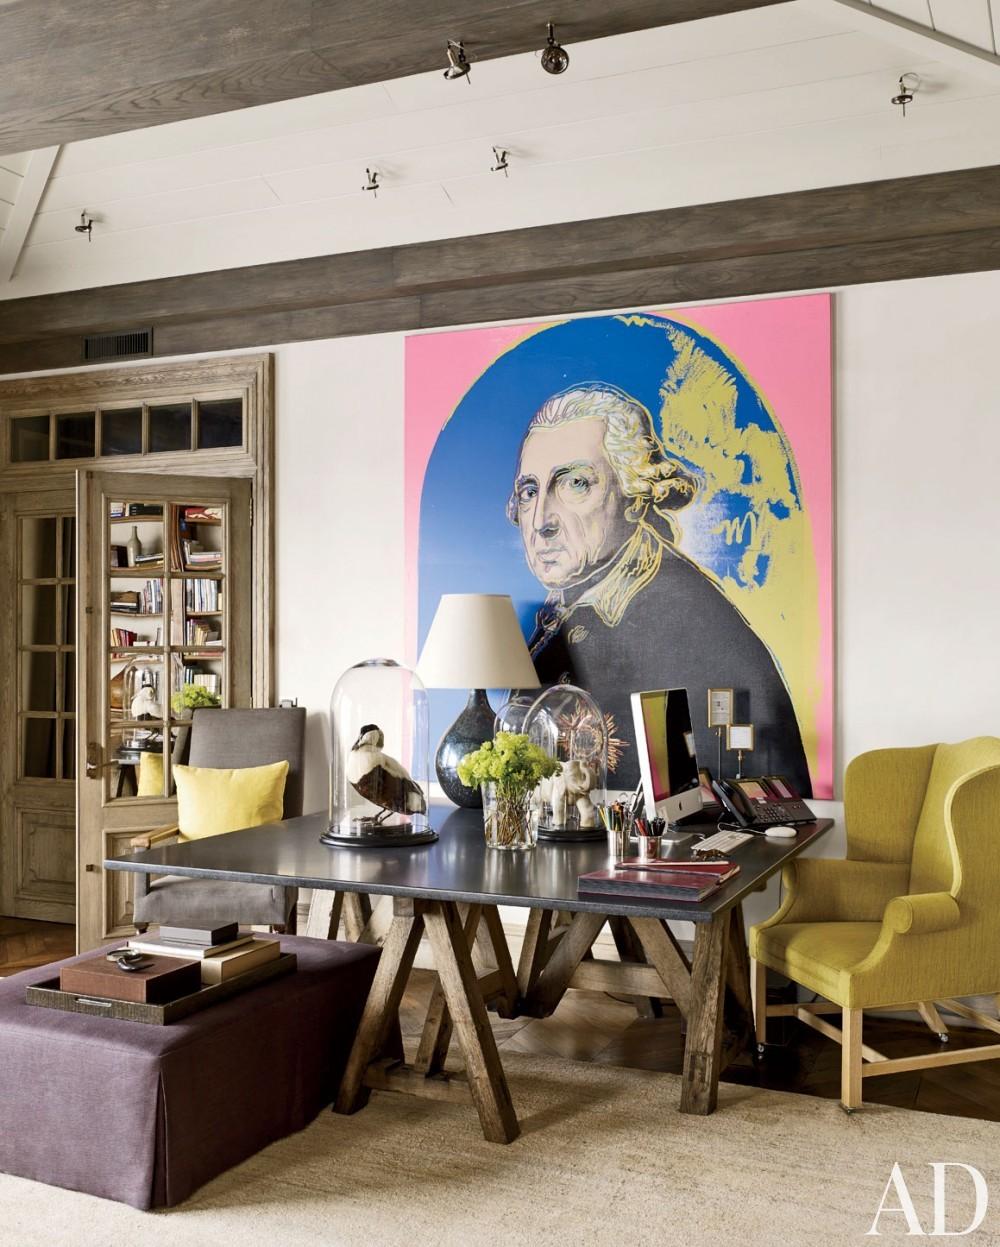 Rustic Living Room by S. R. Gambrel Inc. and Mathis Meier Architekten in Zurich, Switzerland